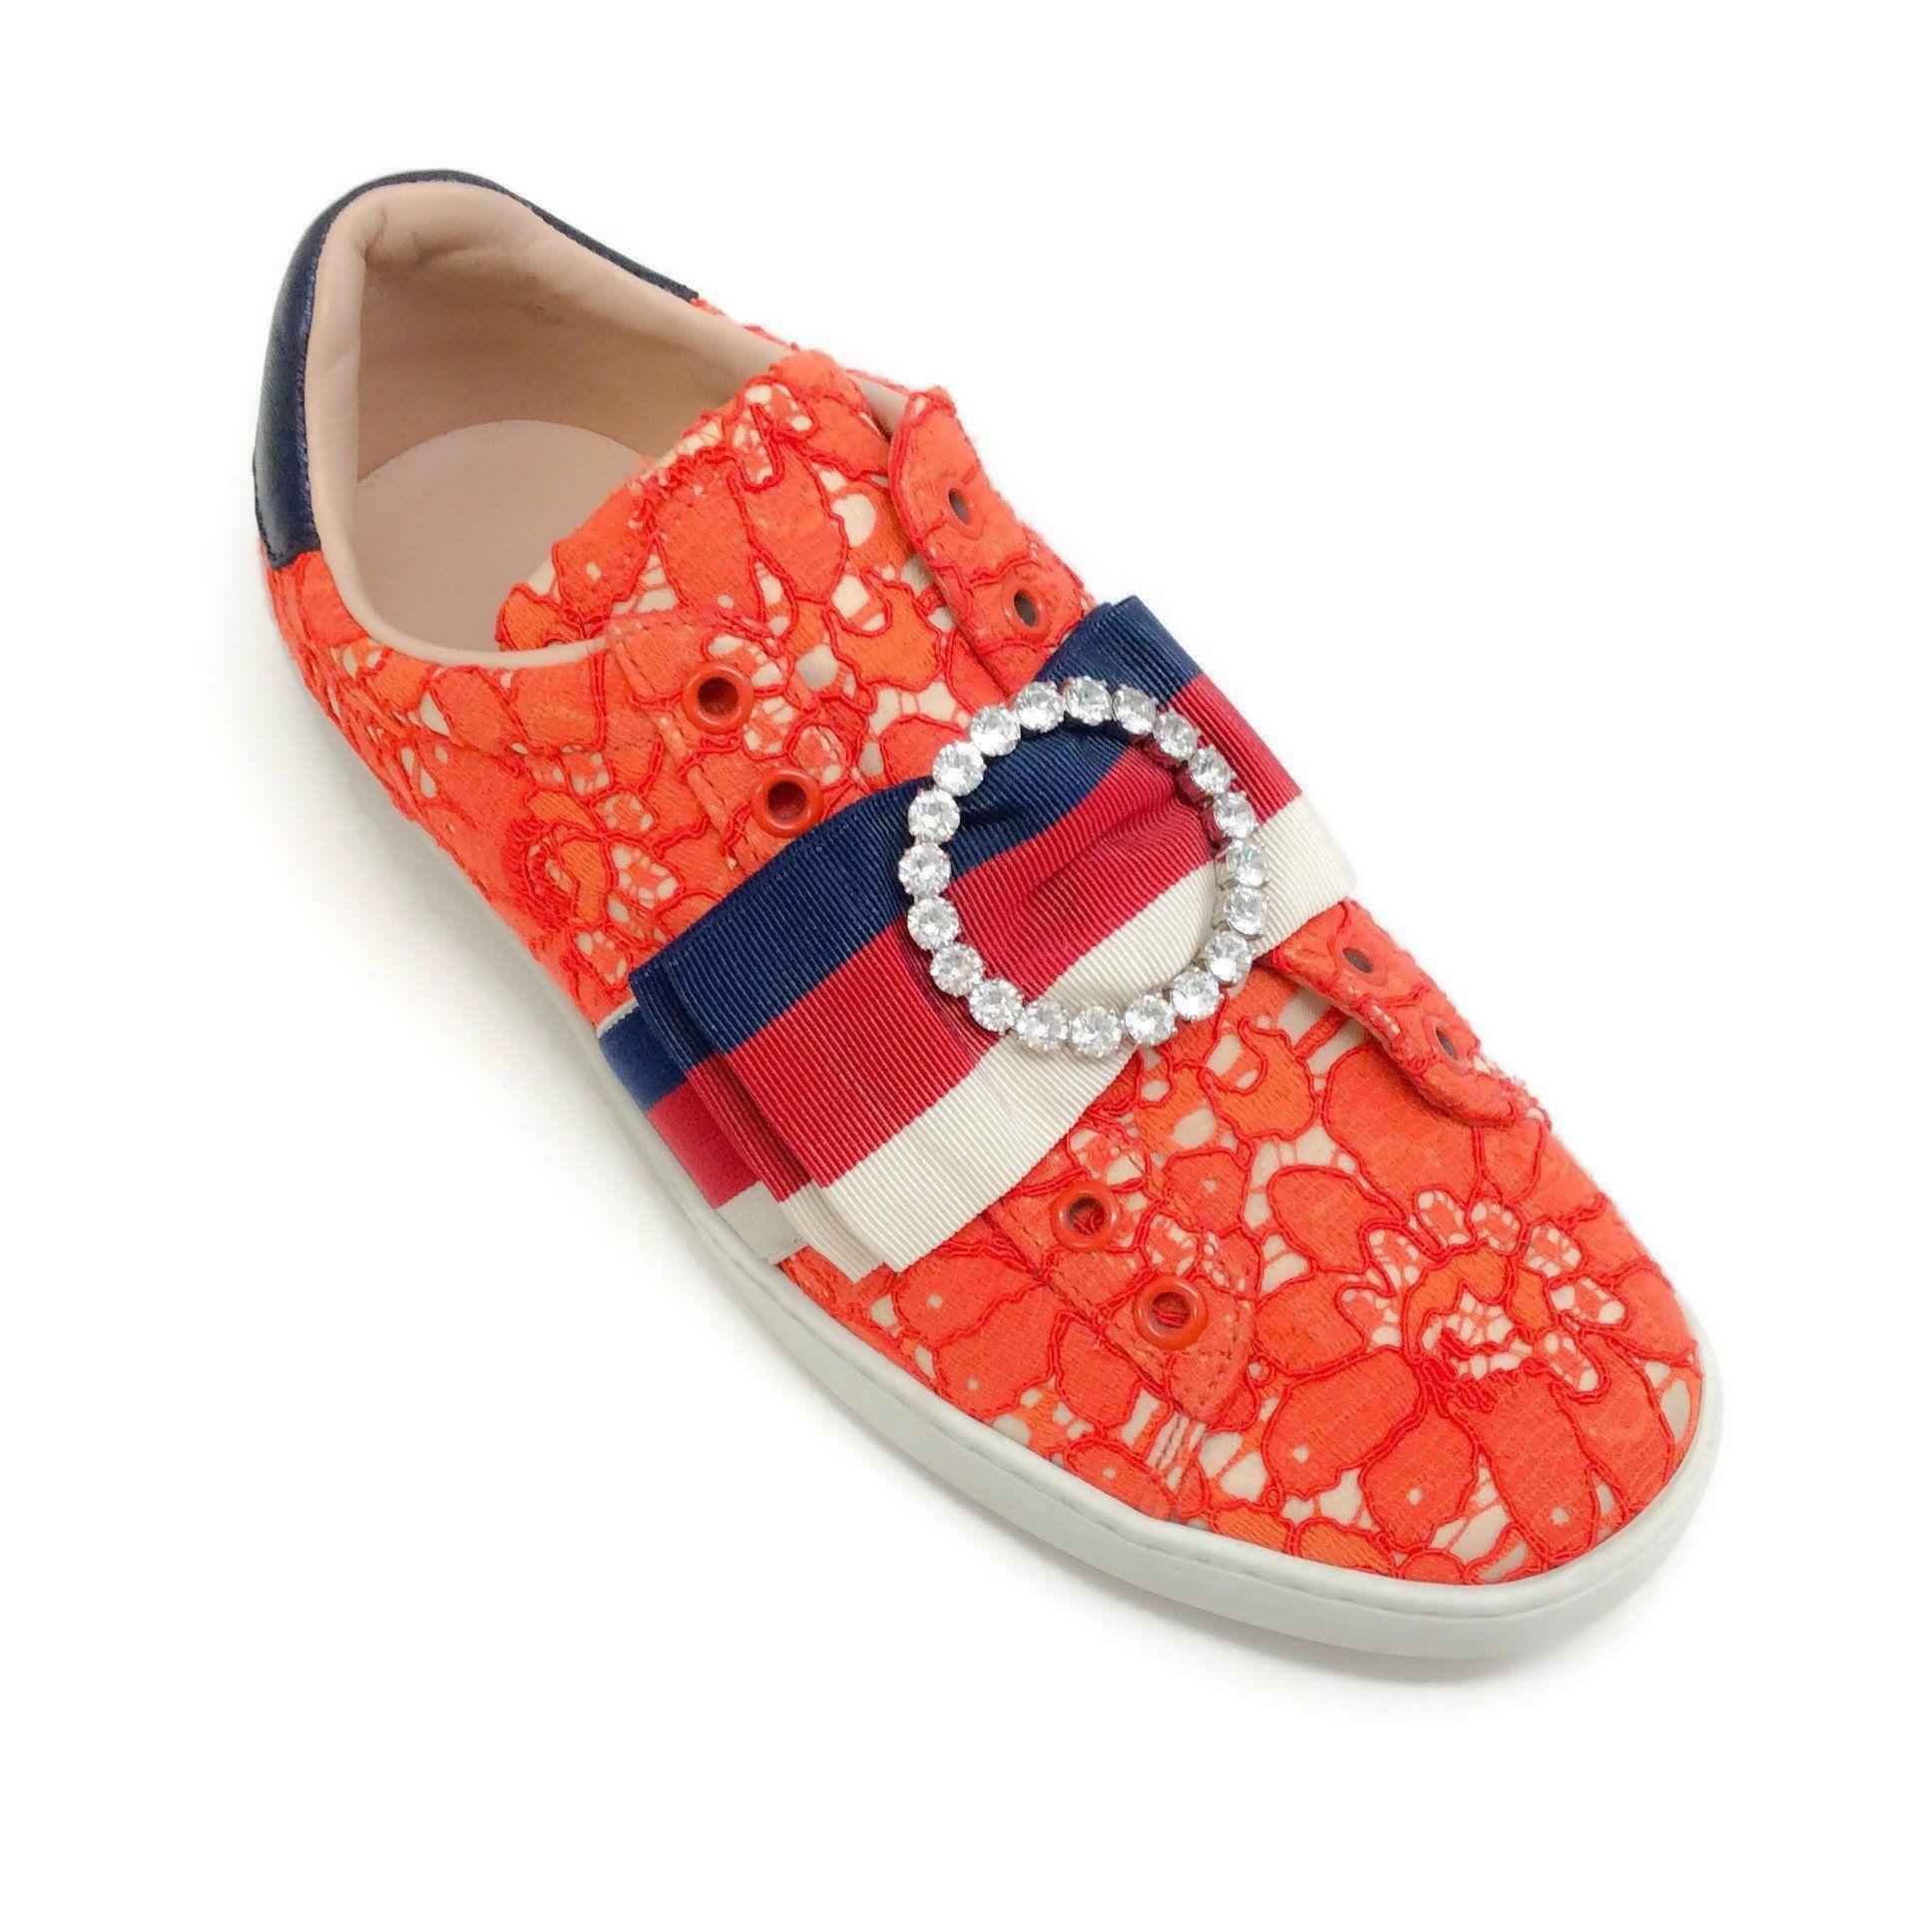 Gucci Orange Lace New Ace Slip On